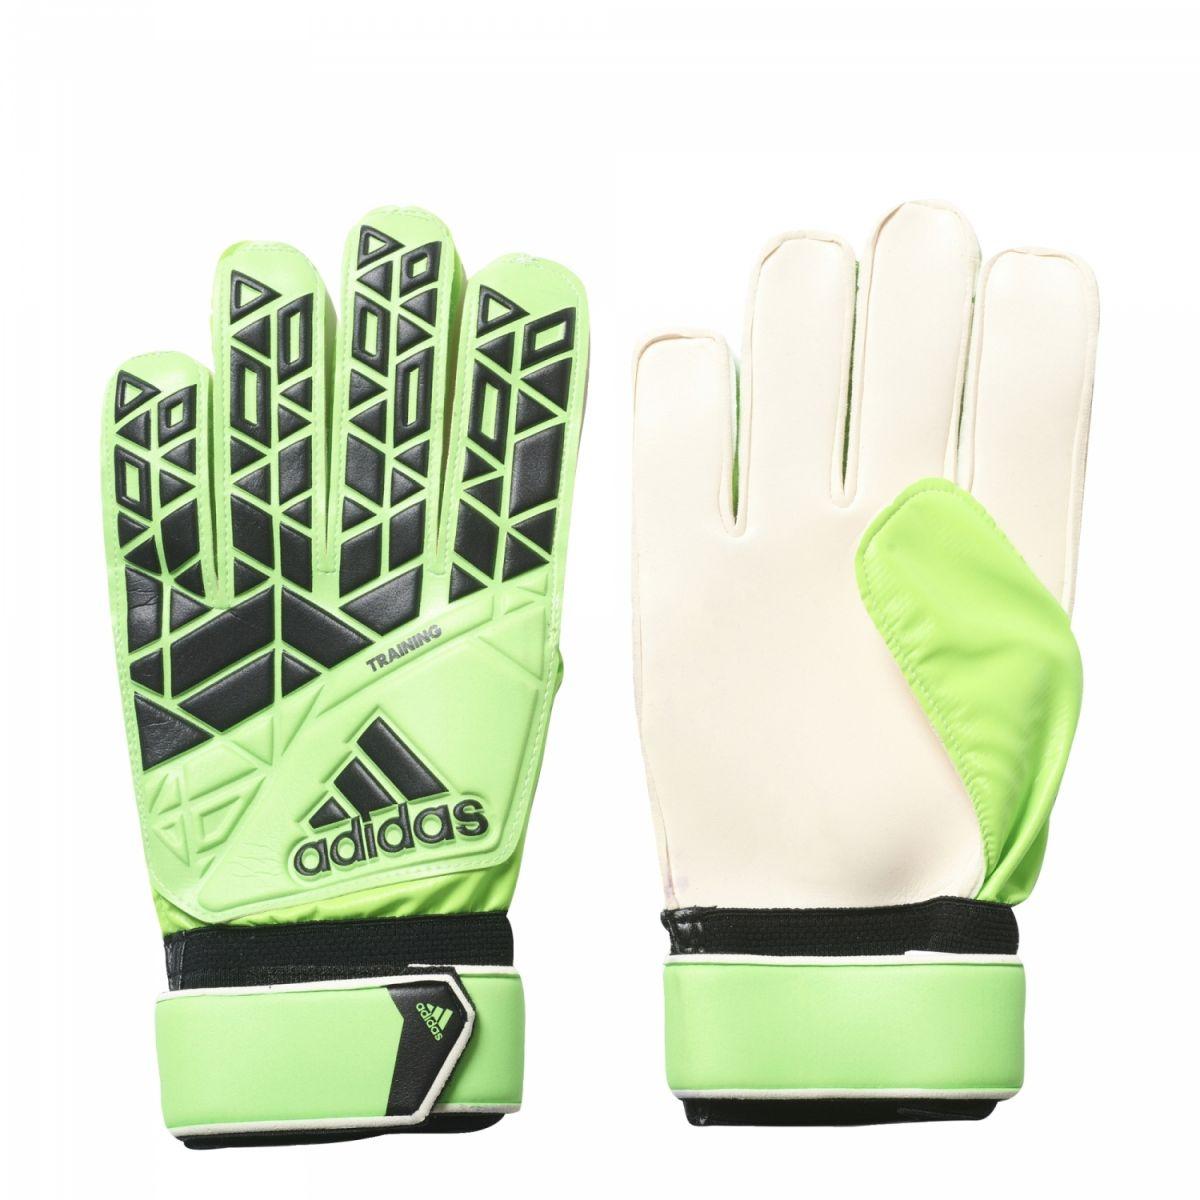 adidas ACE Training Torwarthandschuhe grün schwarz